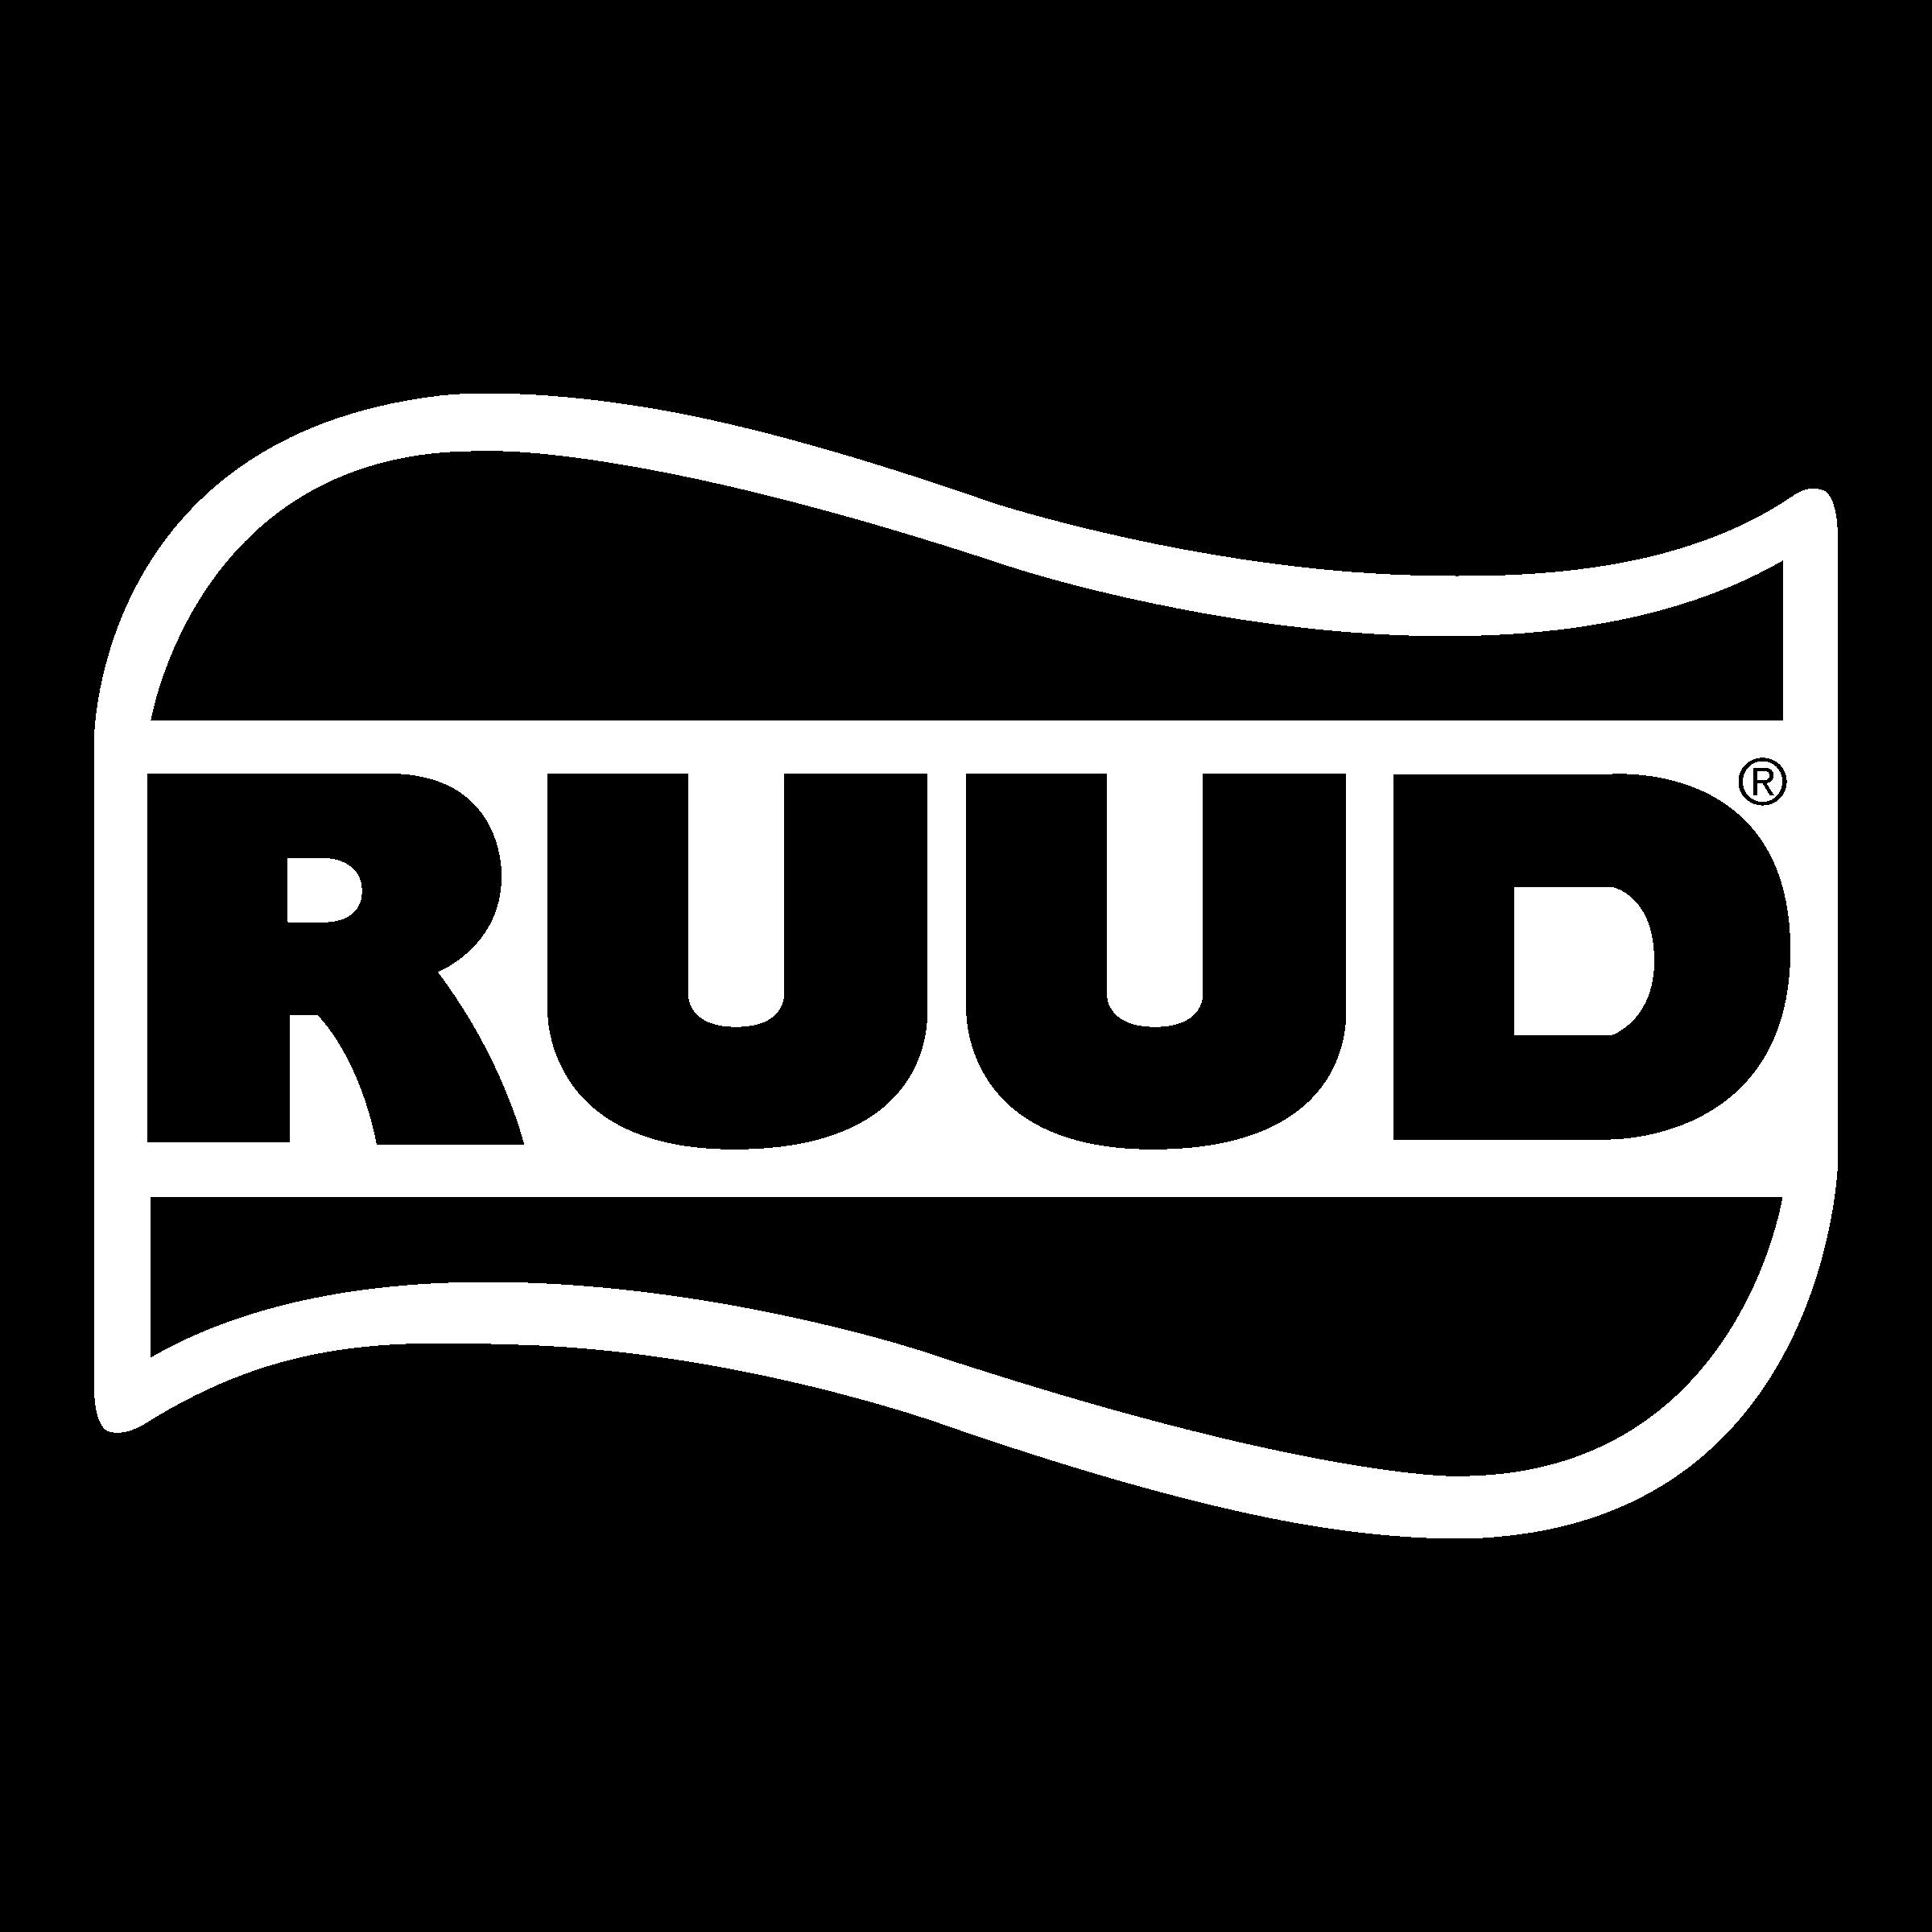 ruud-1-logo-black-and-white